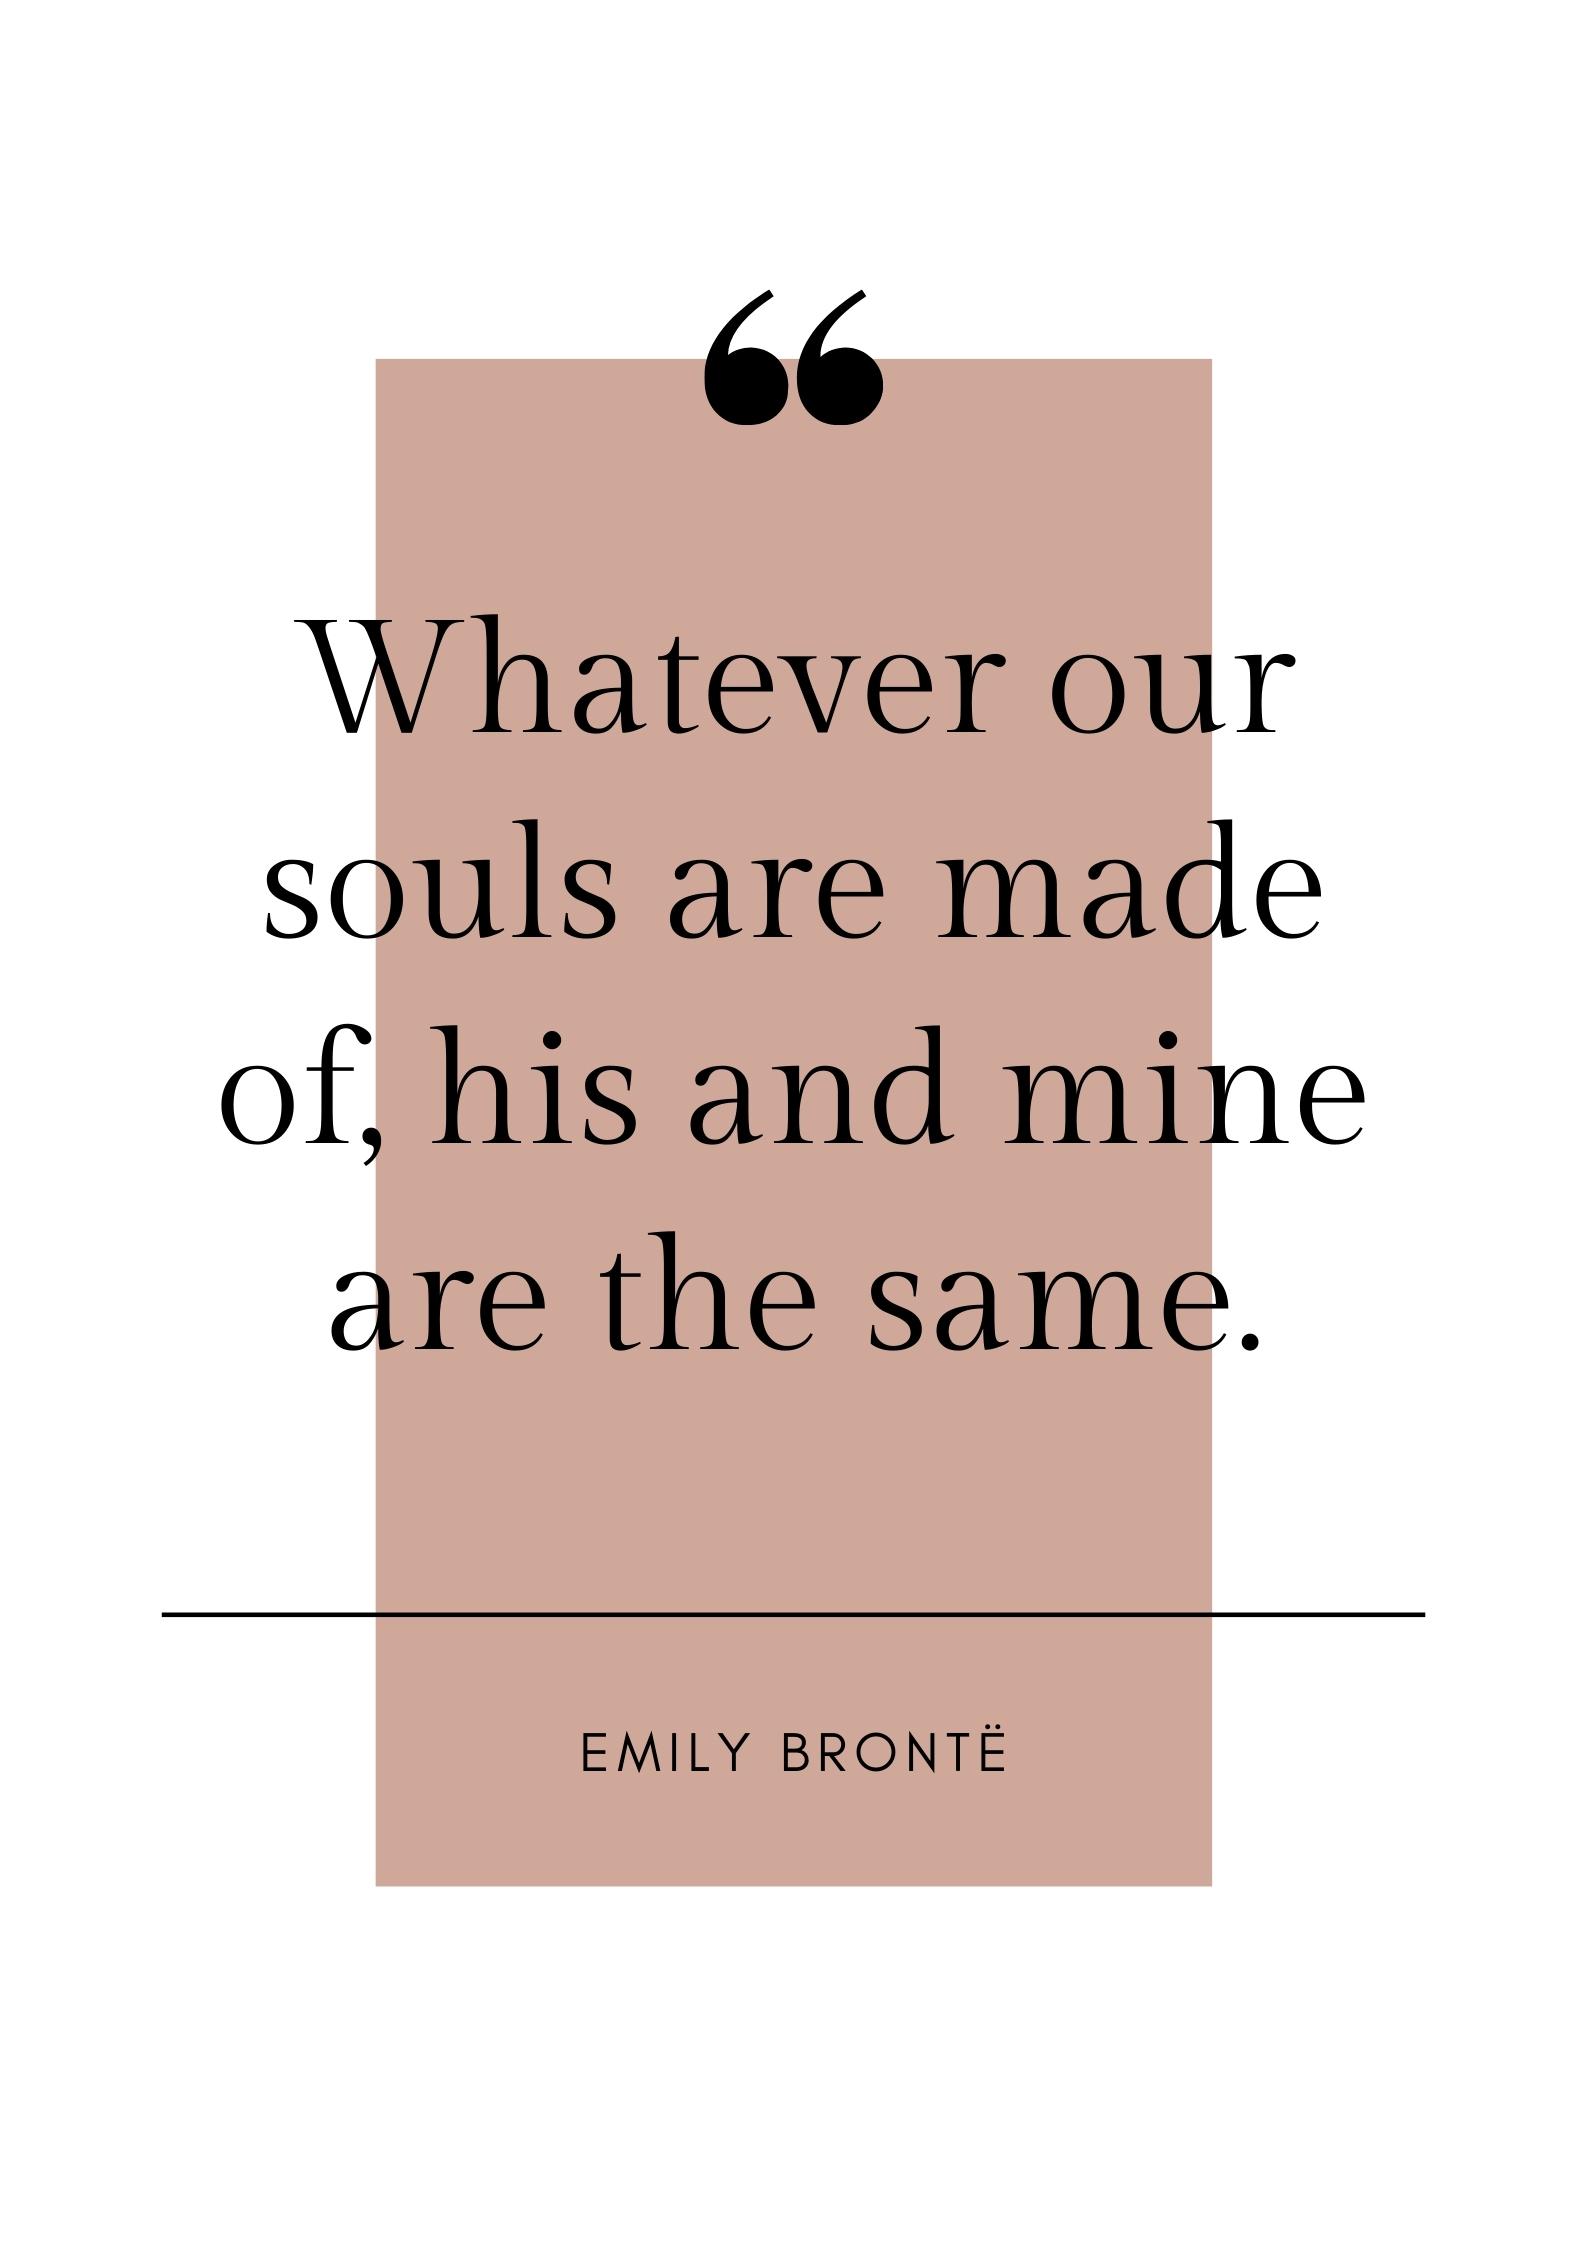 emily bronte quote